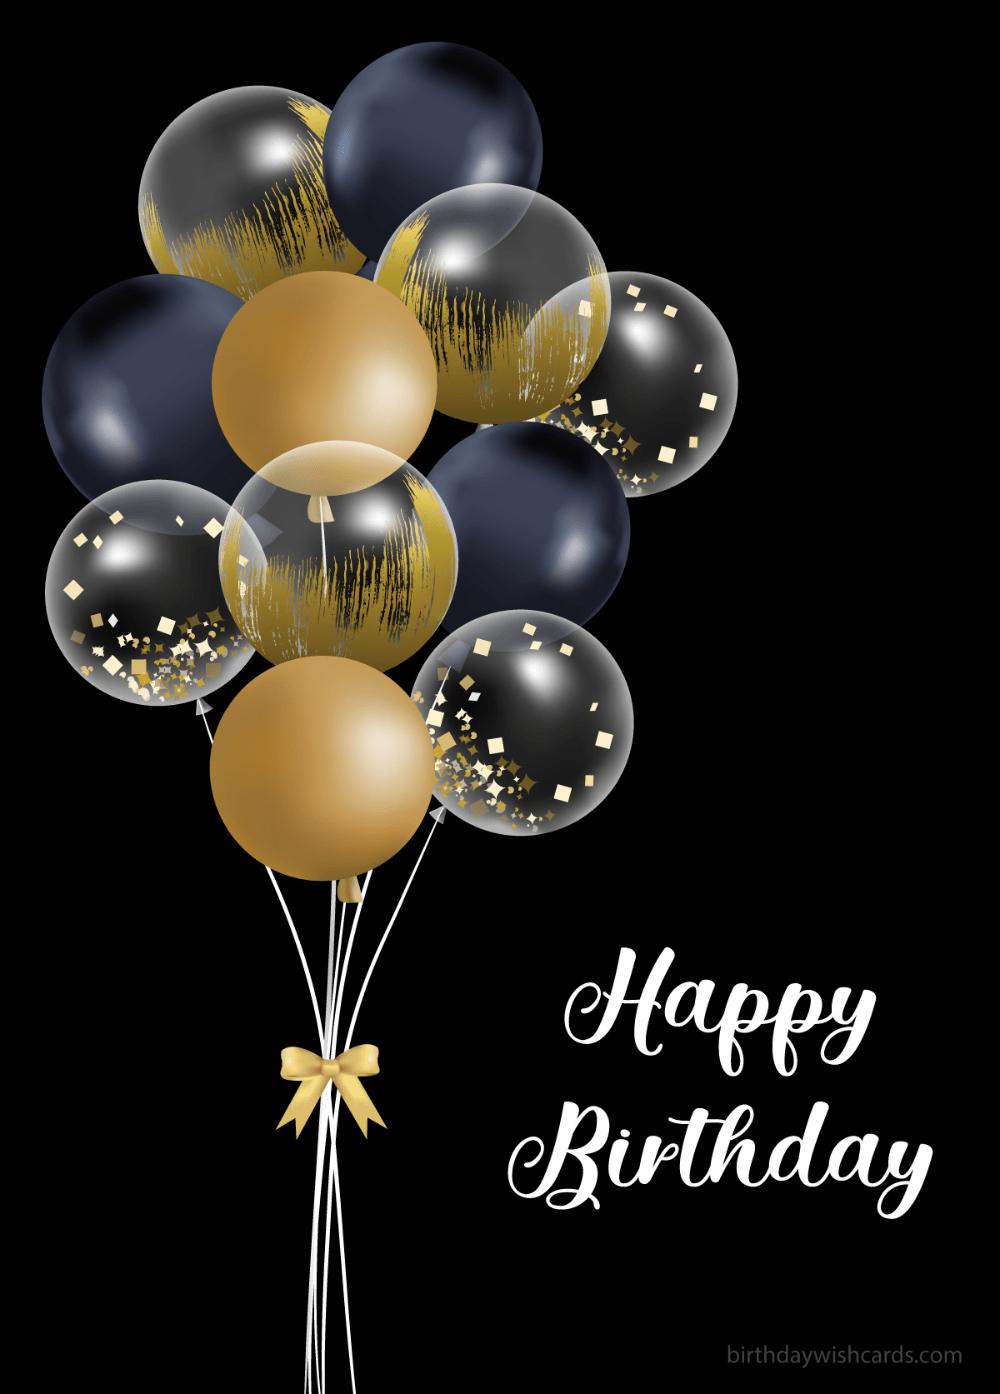 Happy Birthday Wallpaper   EnWallpaper